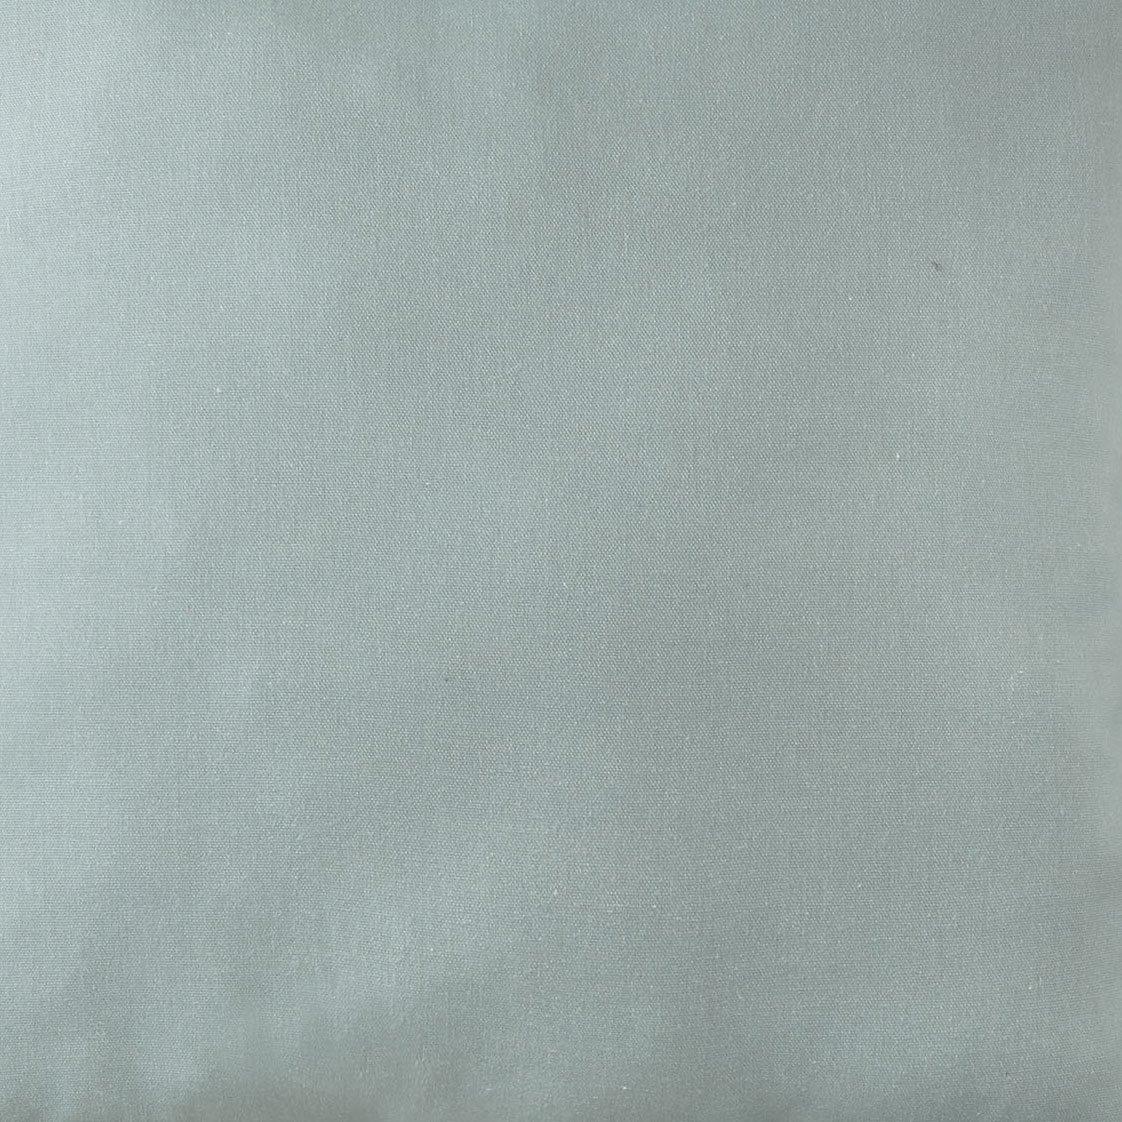 Sylvan Solid Mist Fabric Per Yard